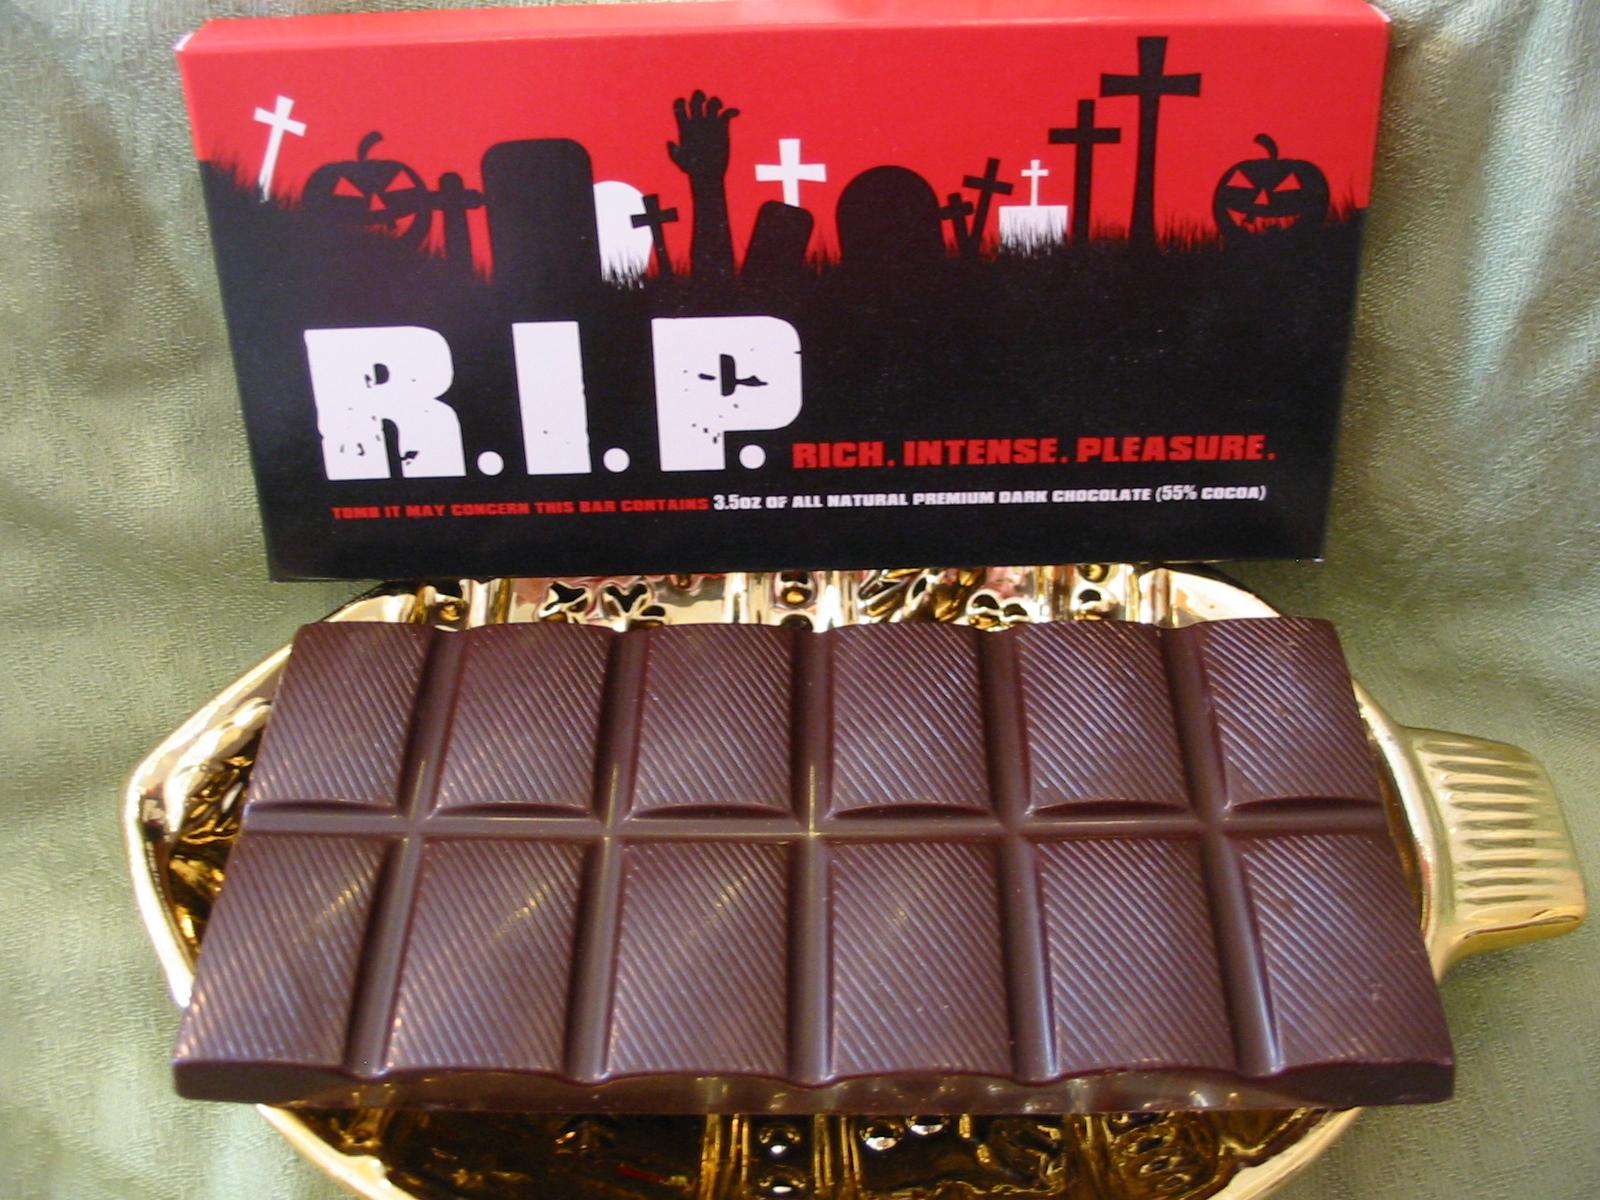 The Chocolate Cult: Scary Big Chocolate Bars